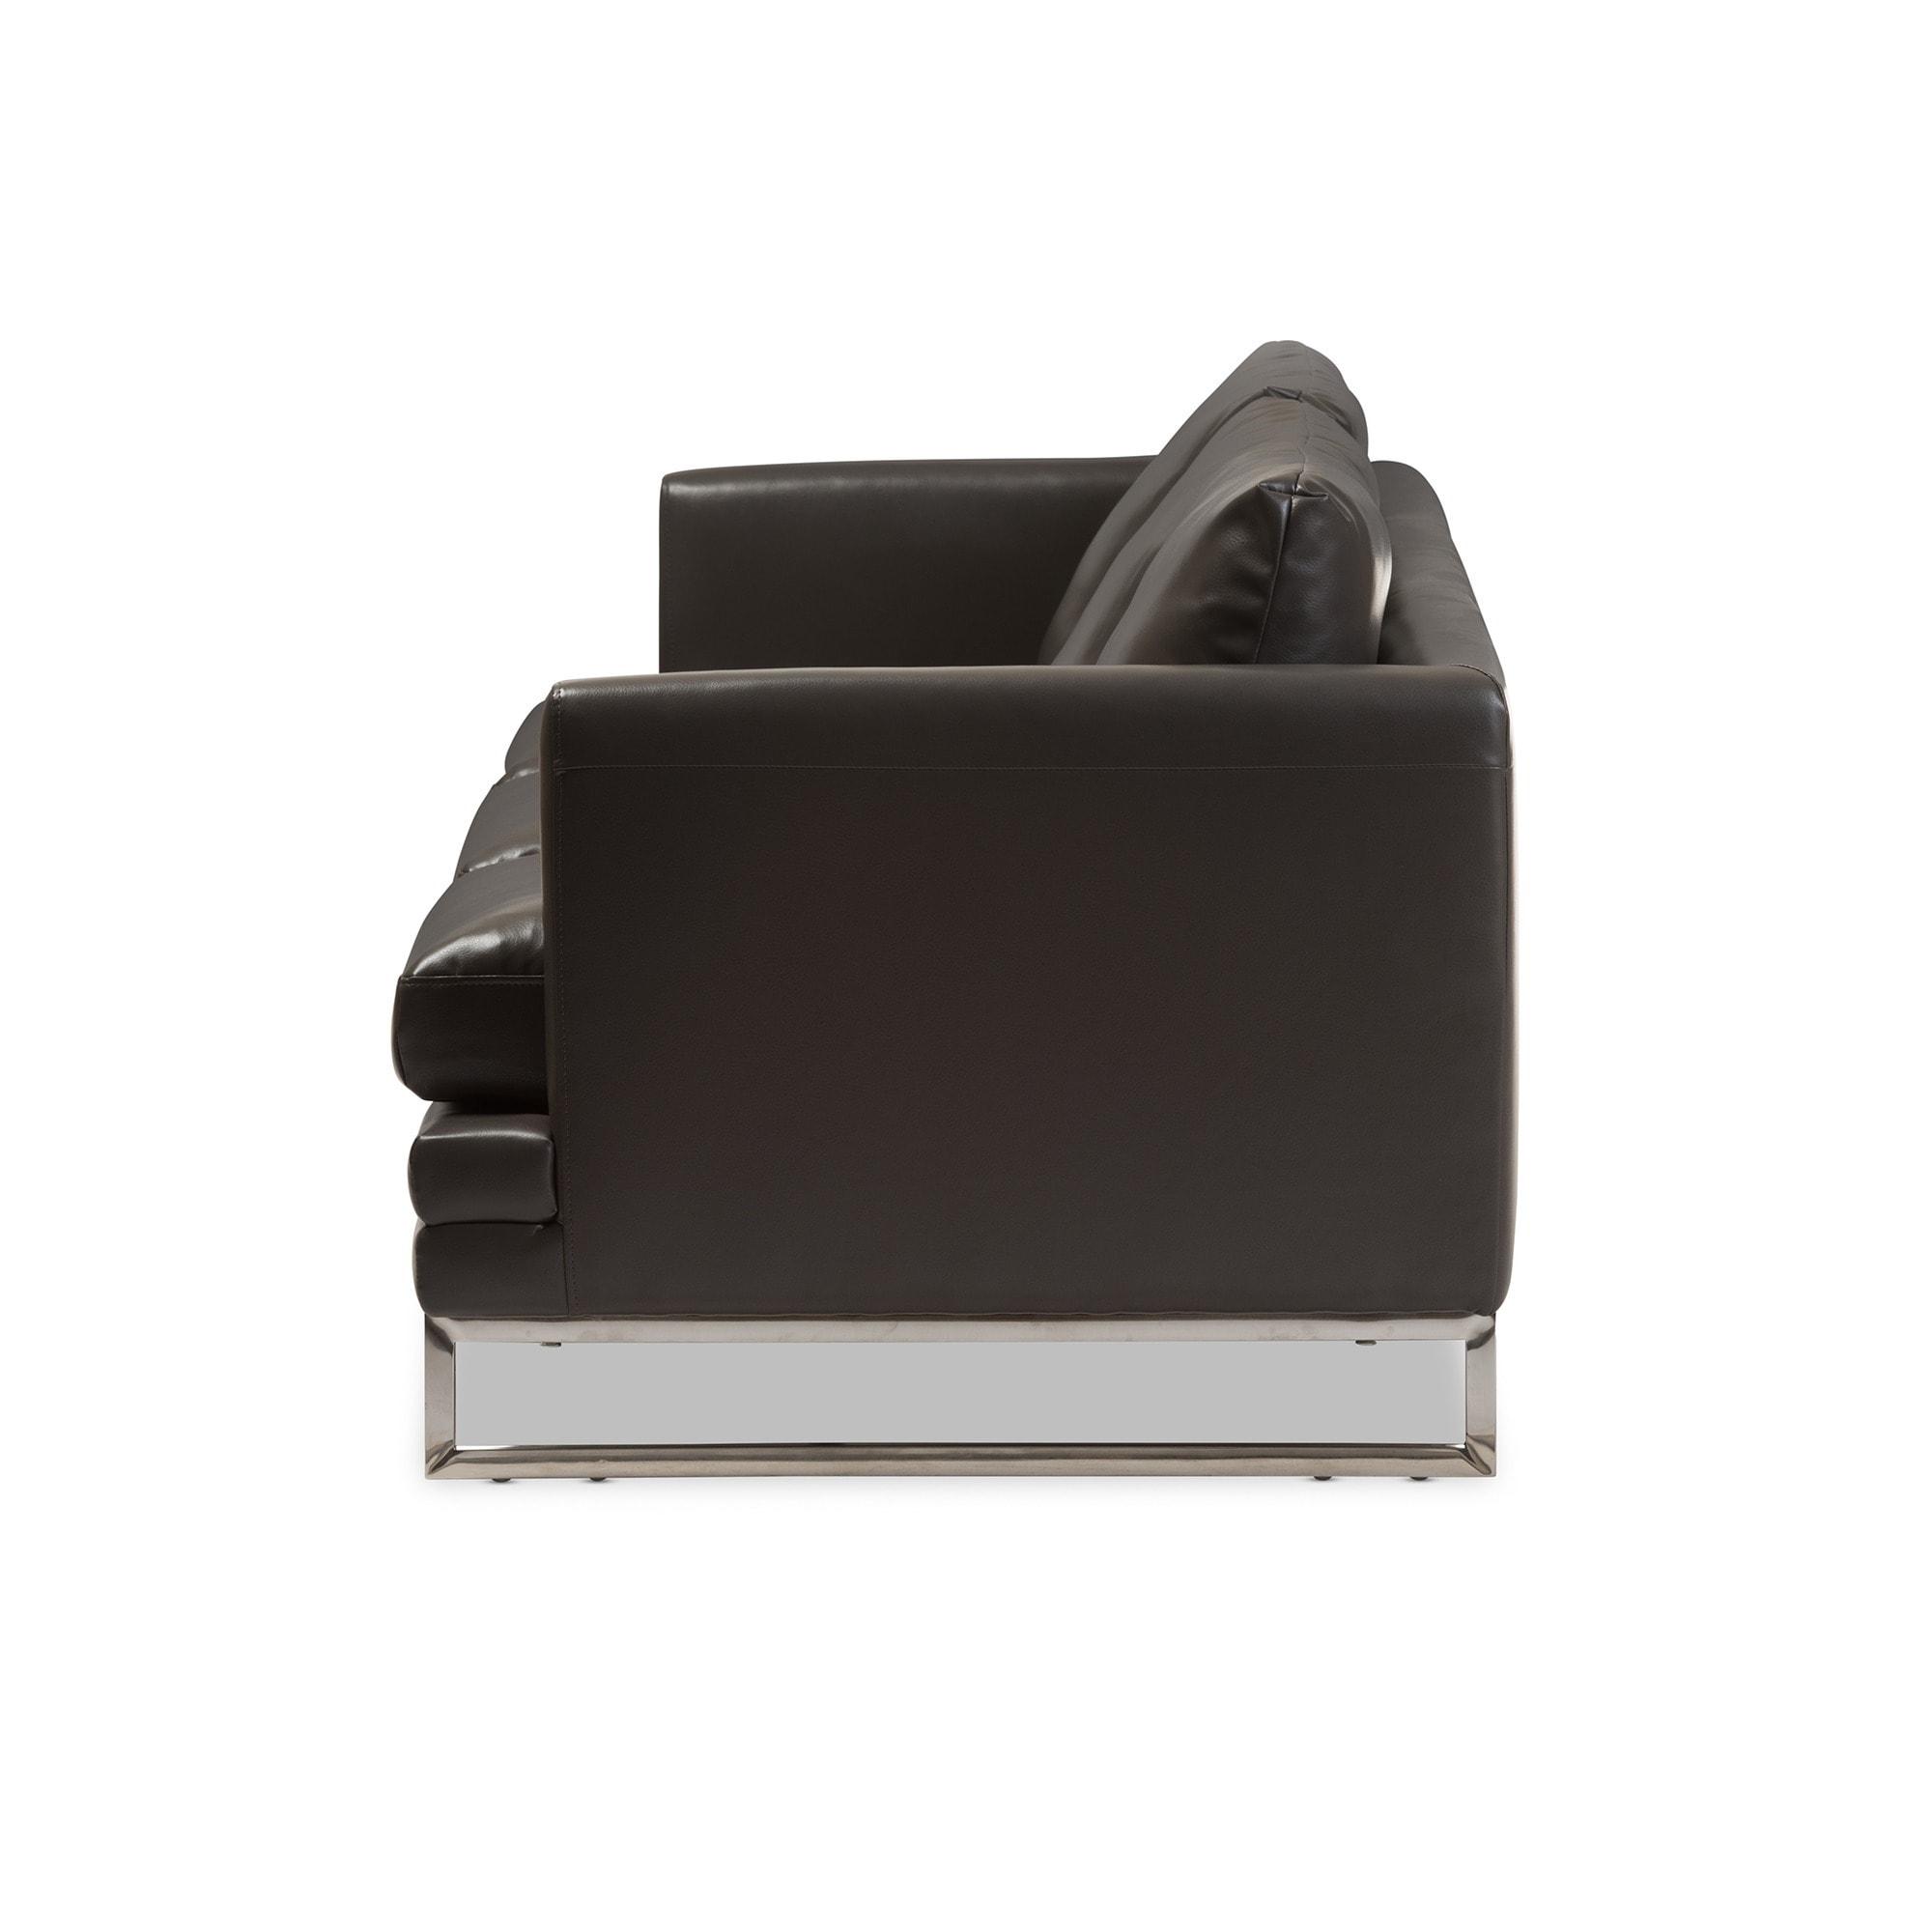 Super Baxton Studio Dakota Pewter Grey Leather Modern Sofa Creativecarmelina Interior Chair Design Creativecarmelinacom